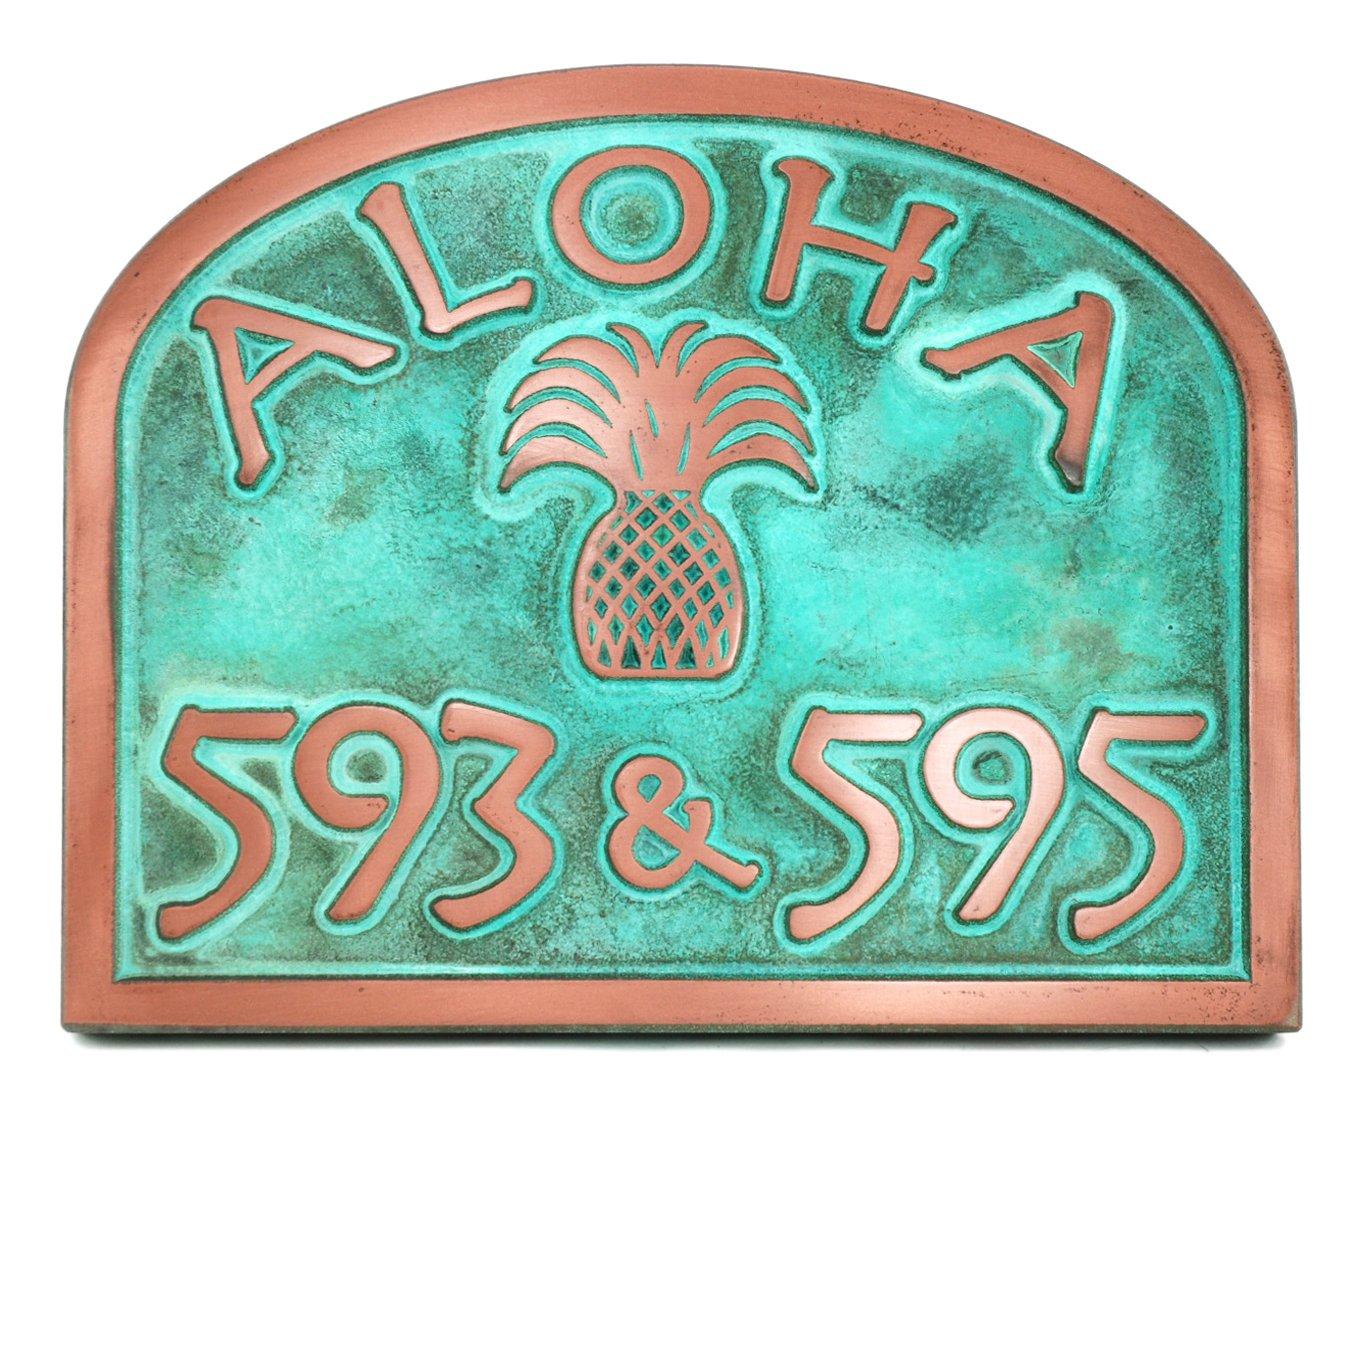 Aloha Hello Welcome Pineapple Address Plaque 16x12.6 - USA Made - Raised Copper Verdi Coated